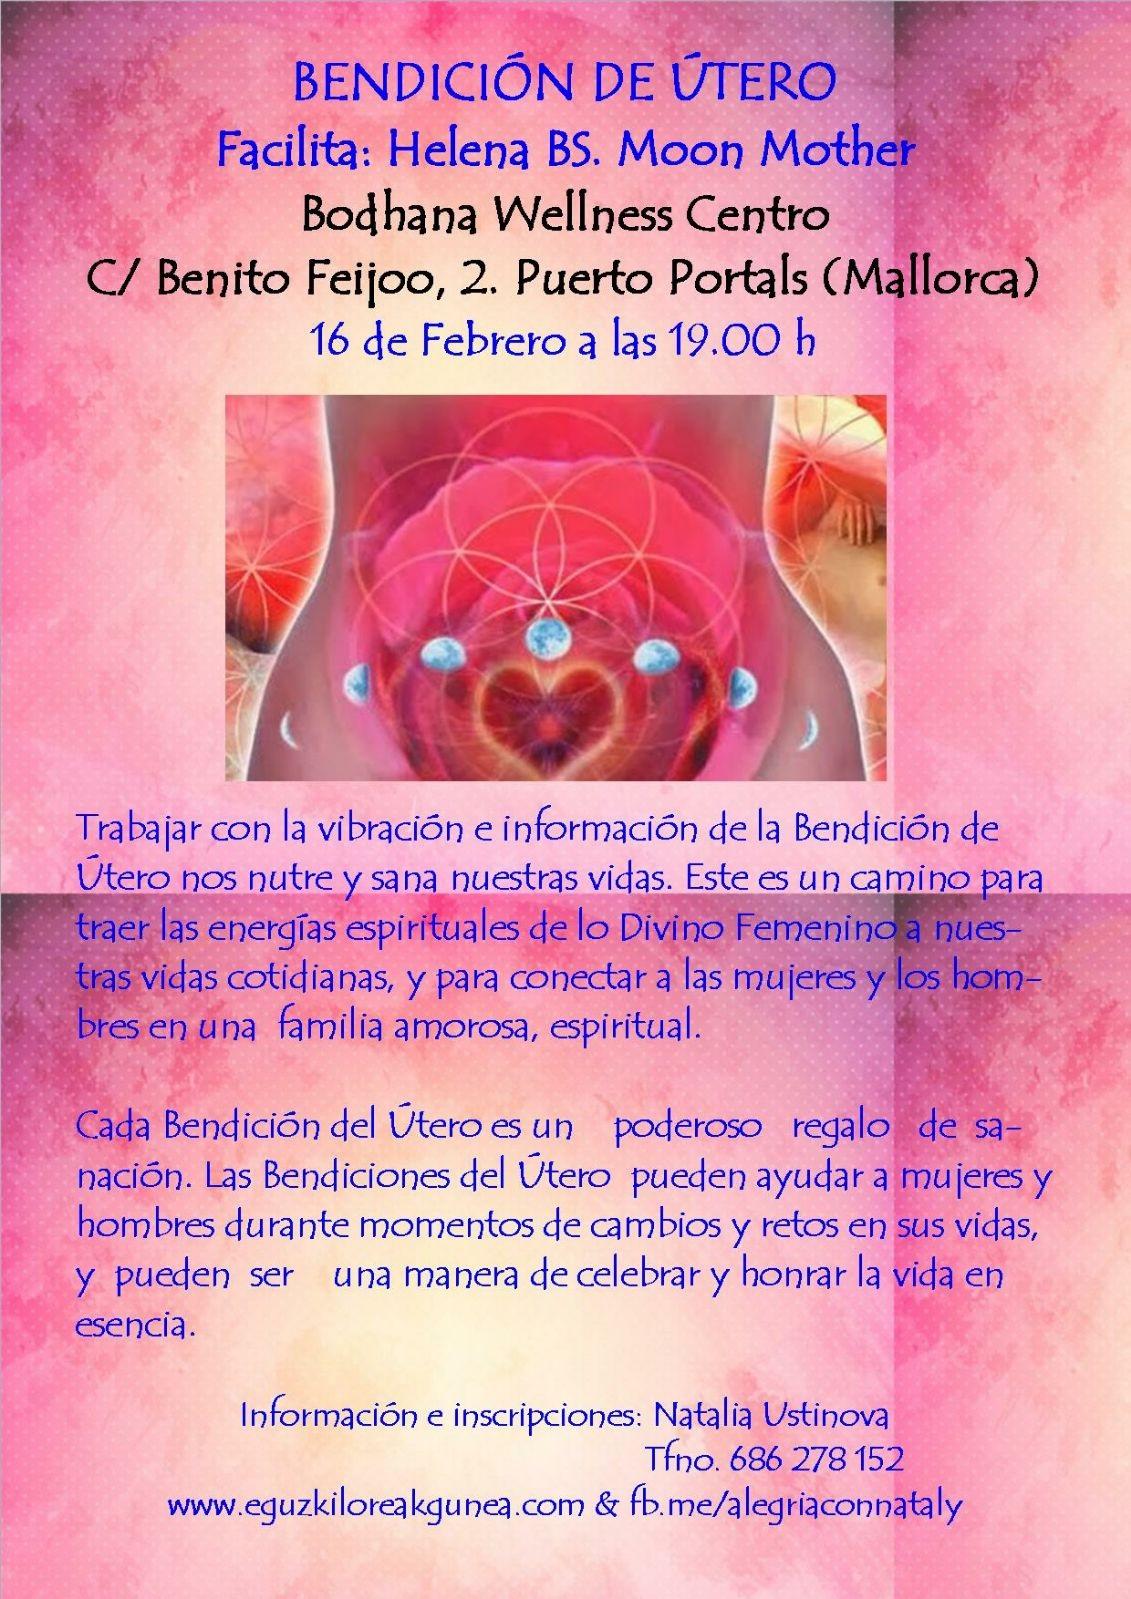 BENDICIÓN DE ÚTERO EL 16 DE FEBRERO EN PALMA DE MALLORCA. FACILITA: HELENA BS